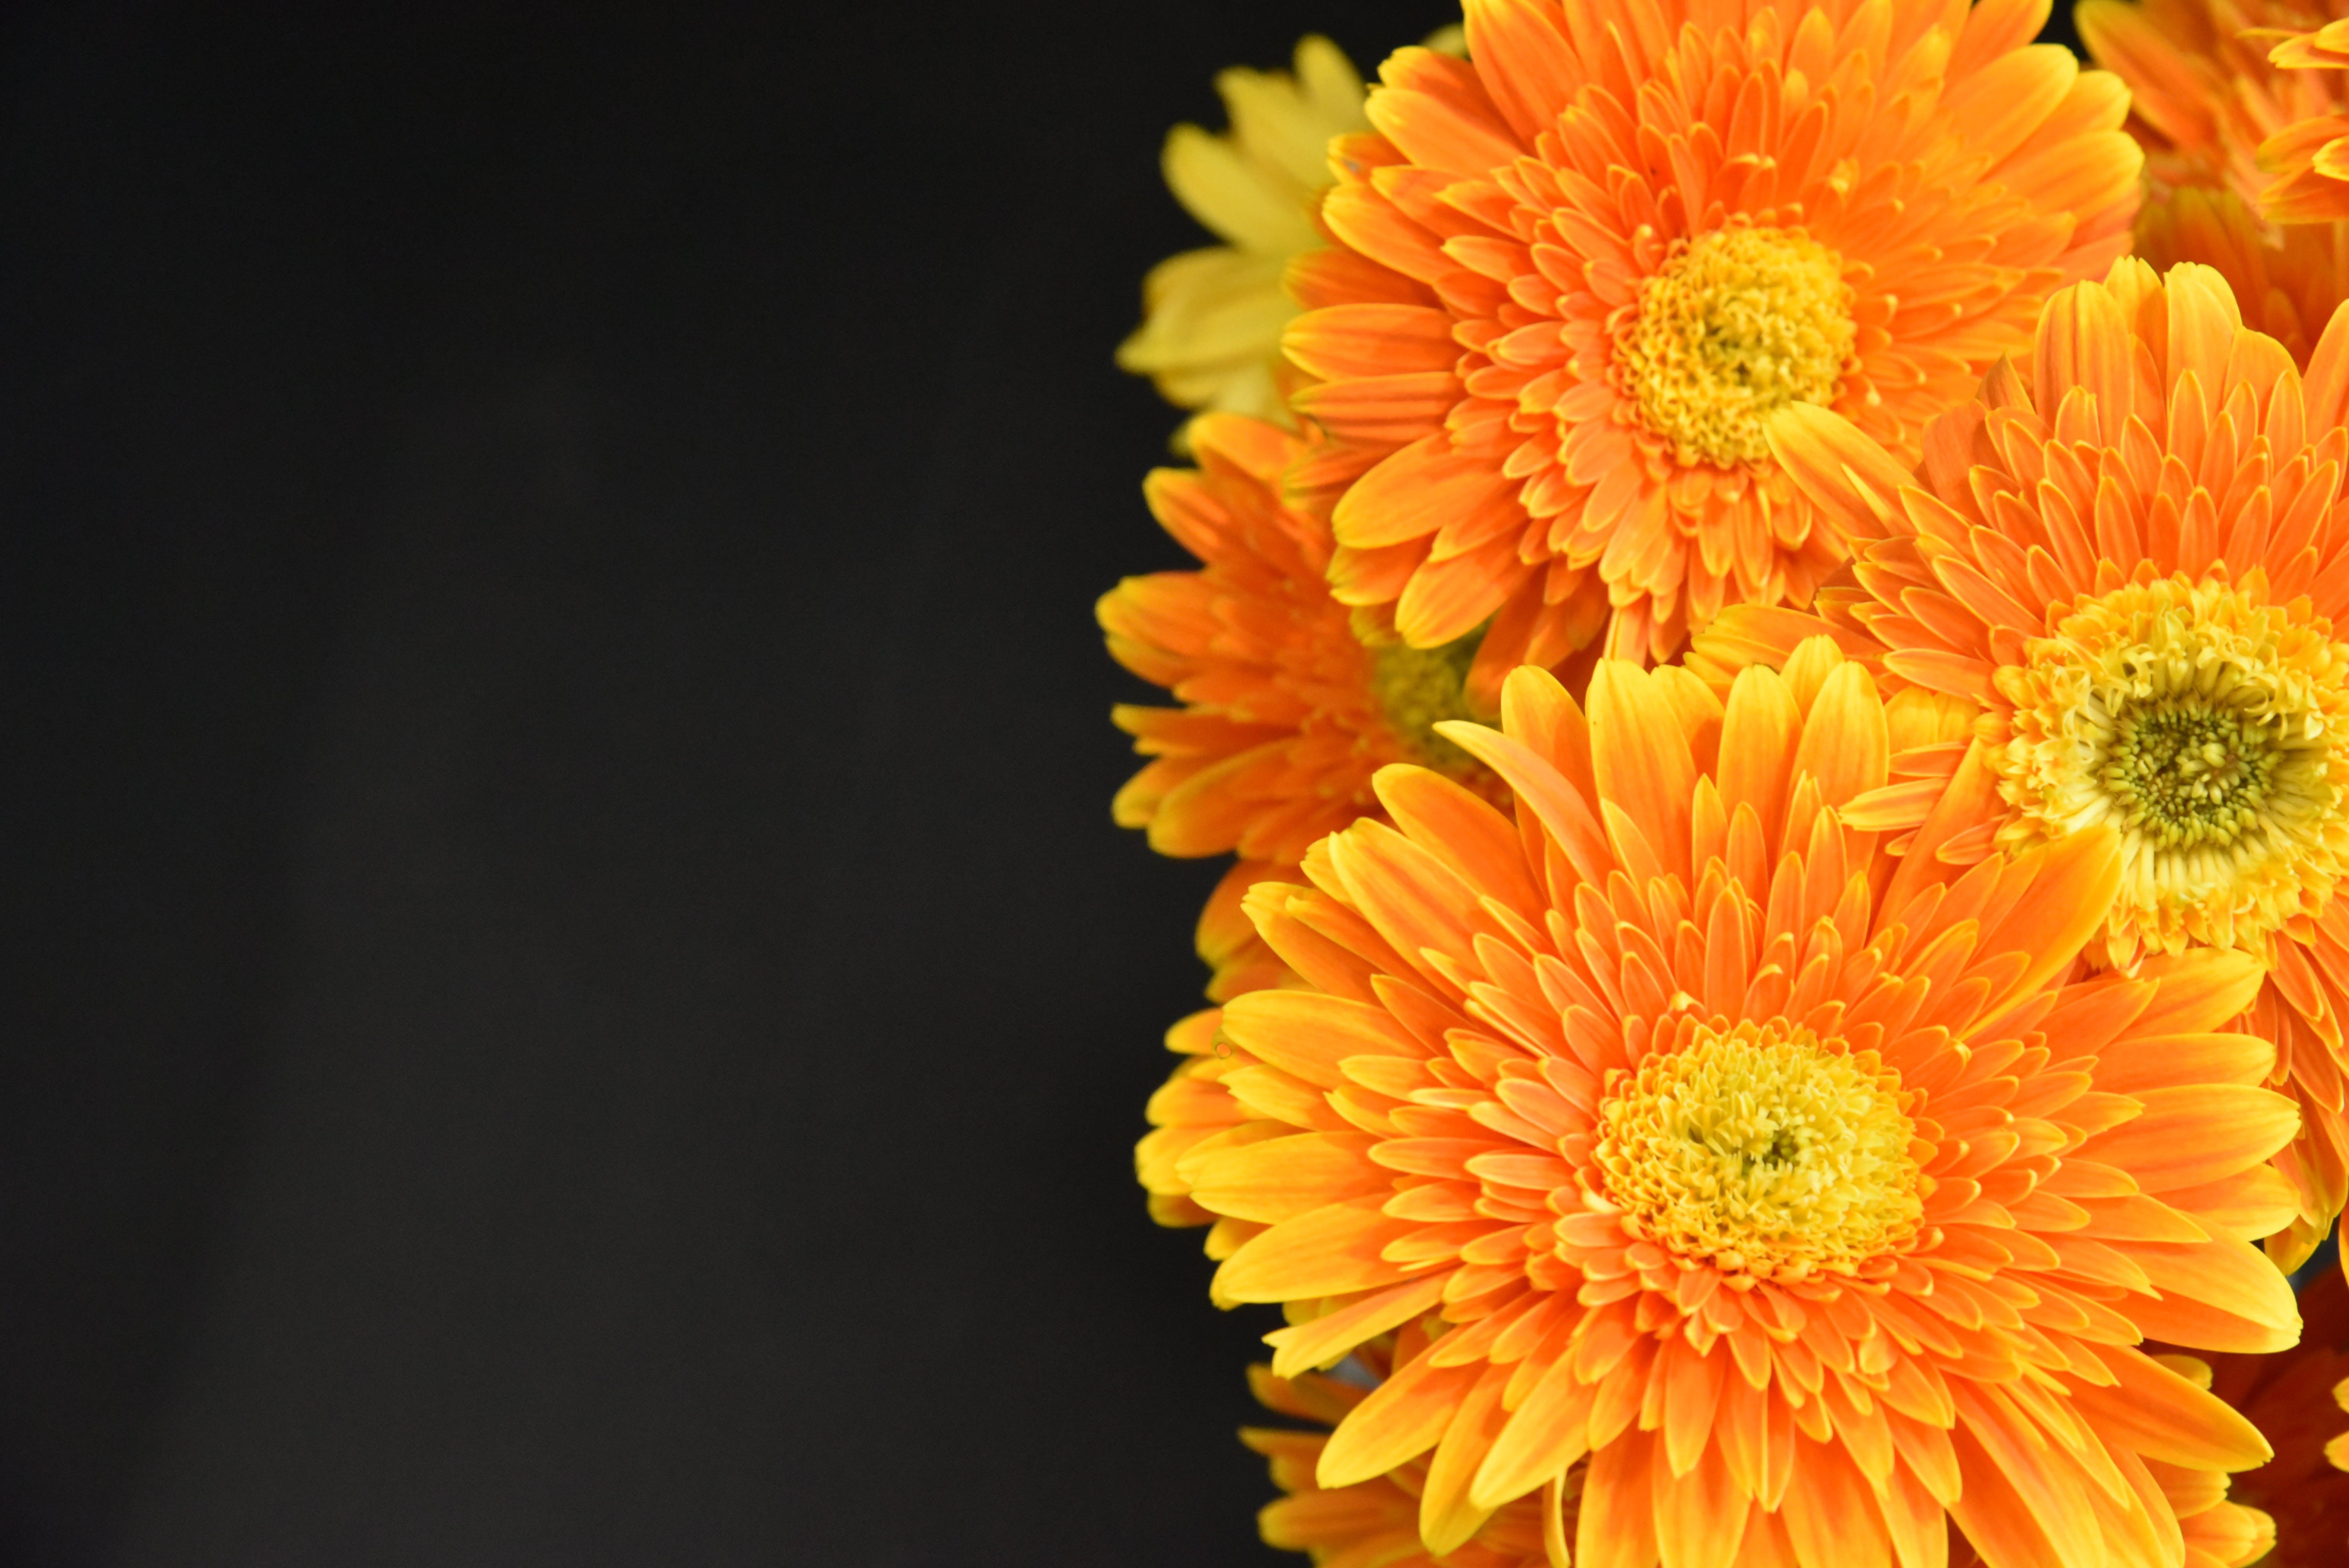 Macro Photography of Orange Flowers